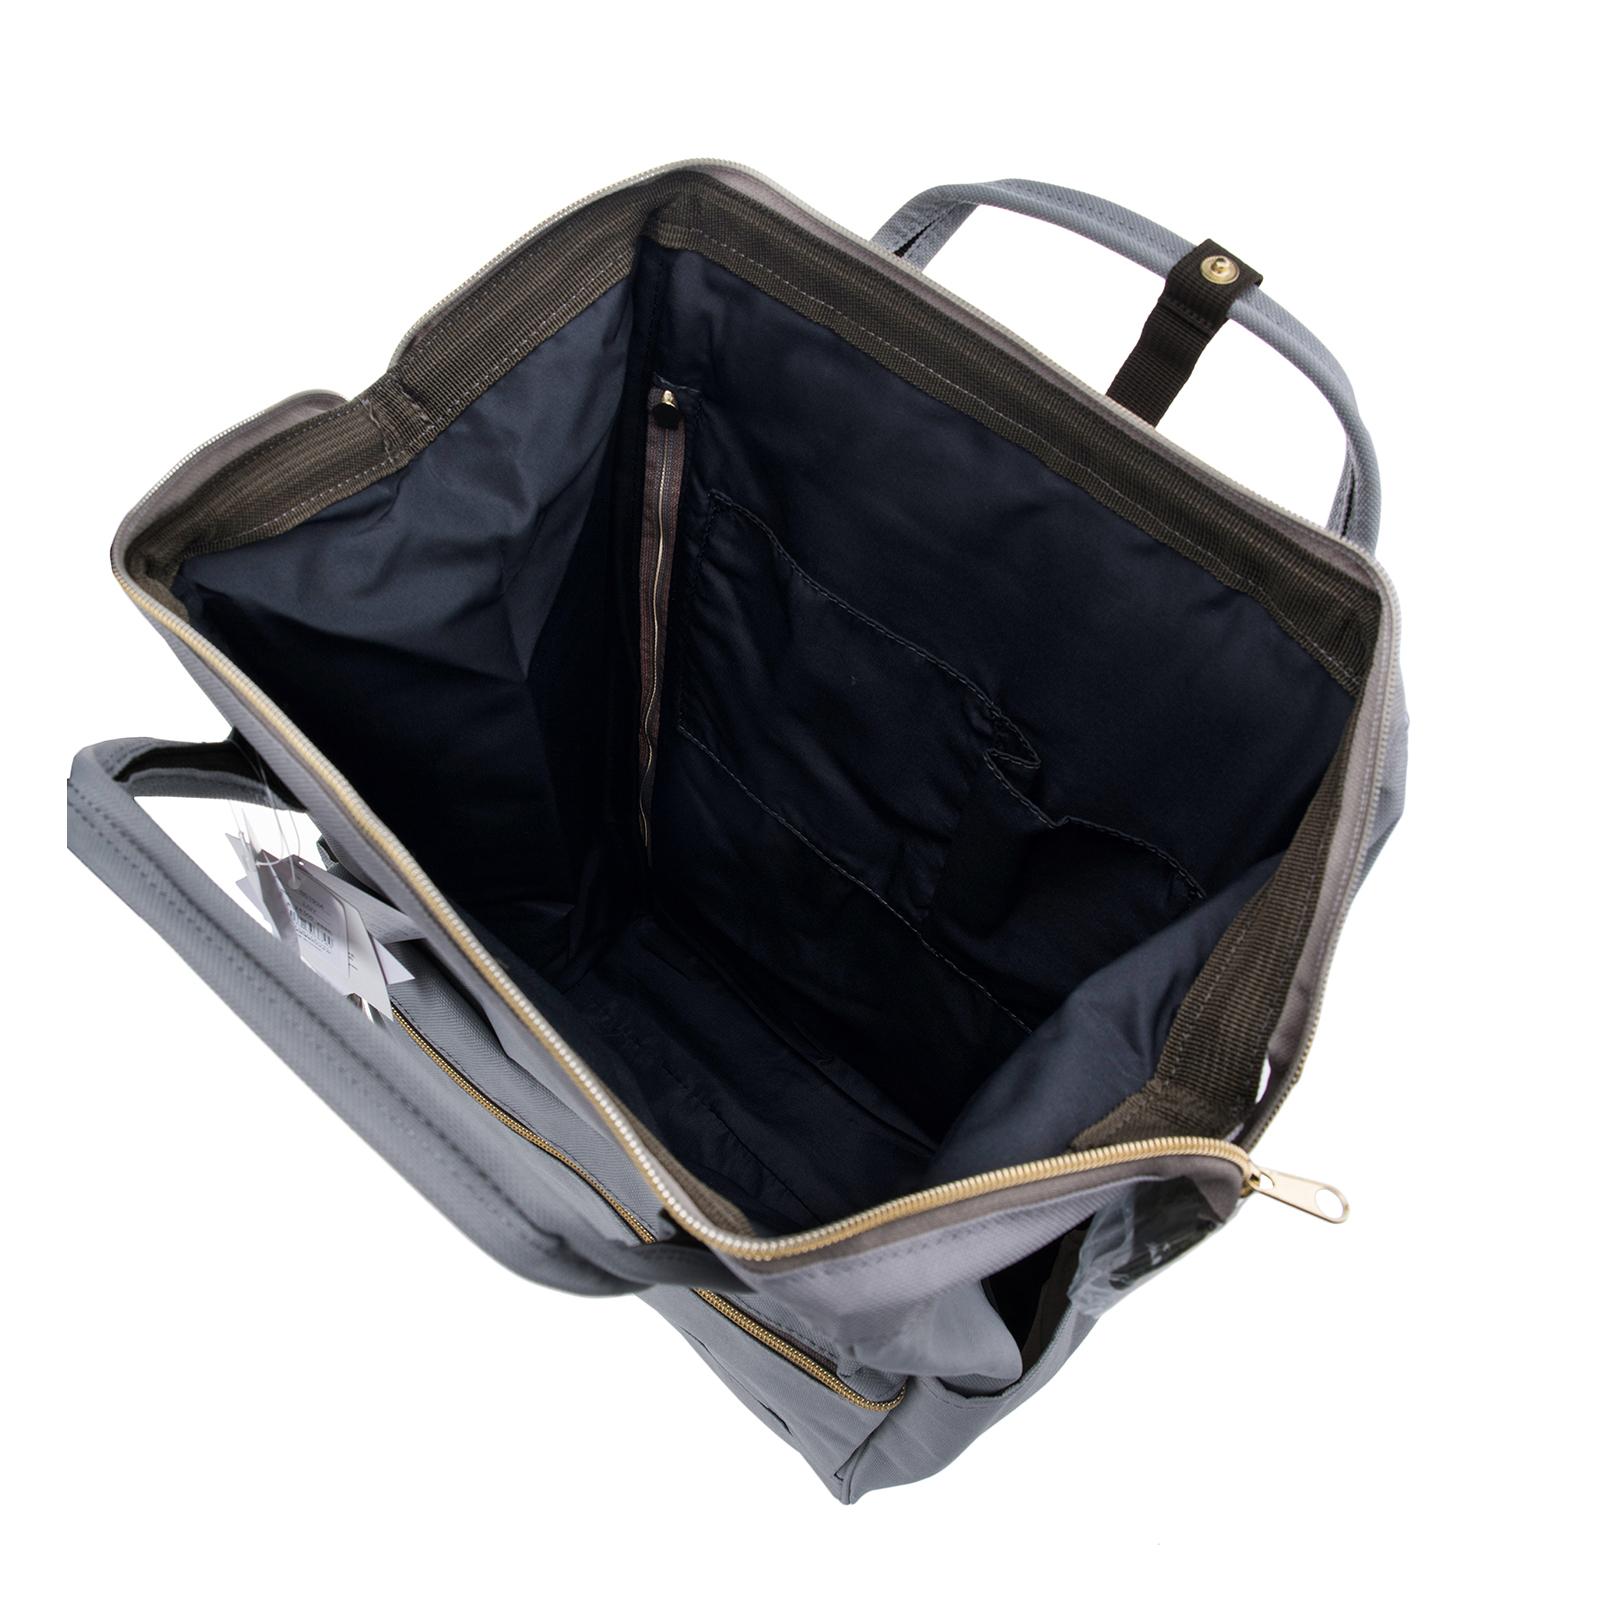 Anello Official Japan Light Grey Regular Backpack Rucksack Diaper Travel Bag image 7